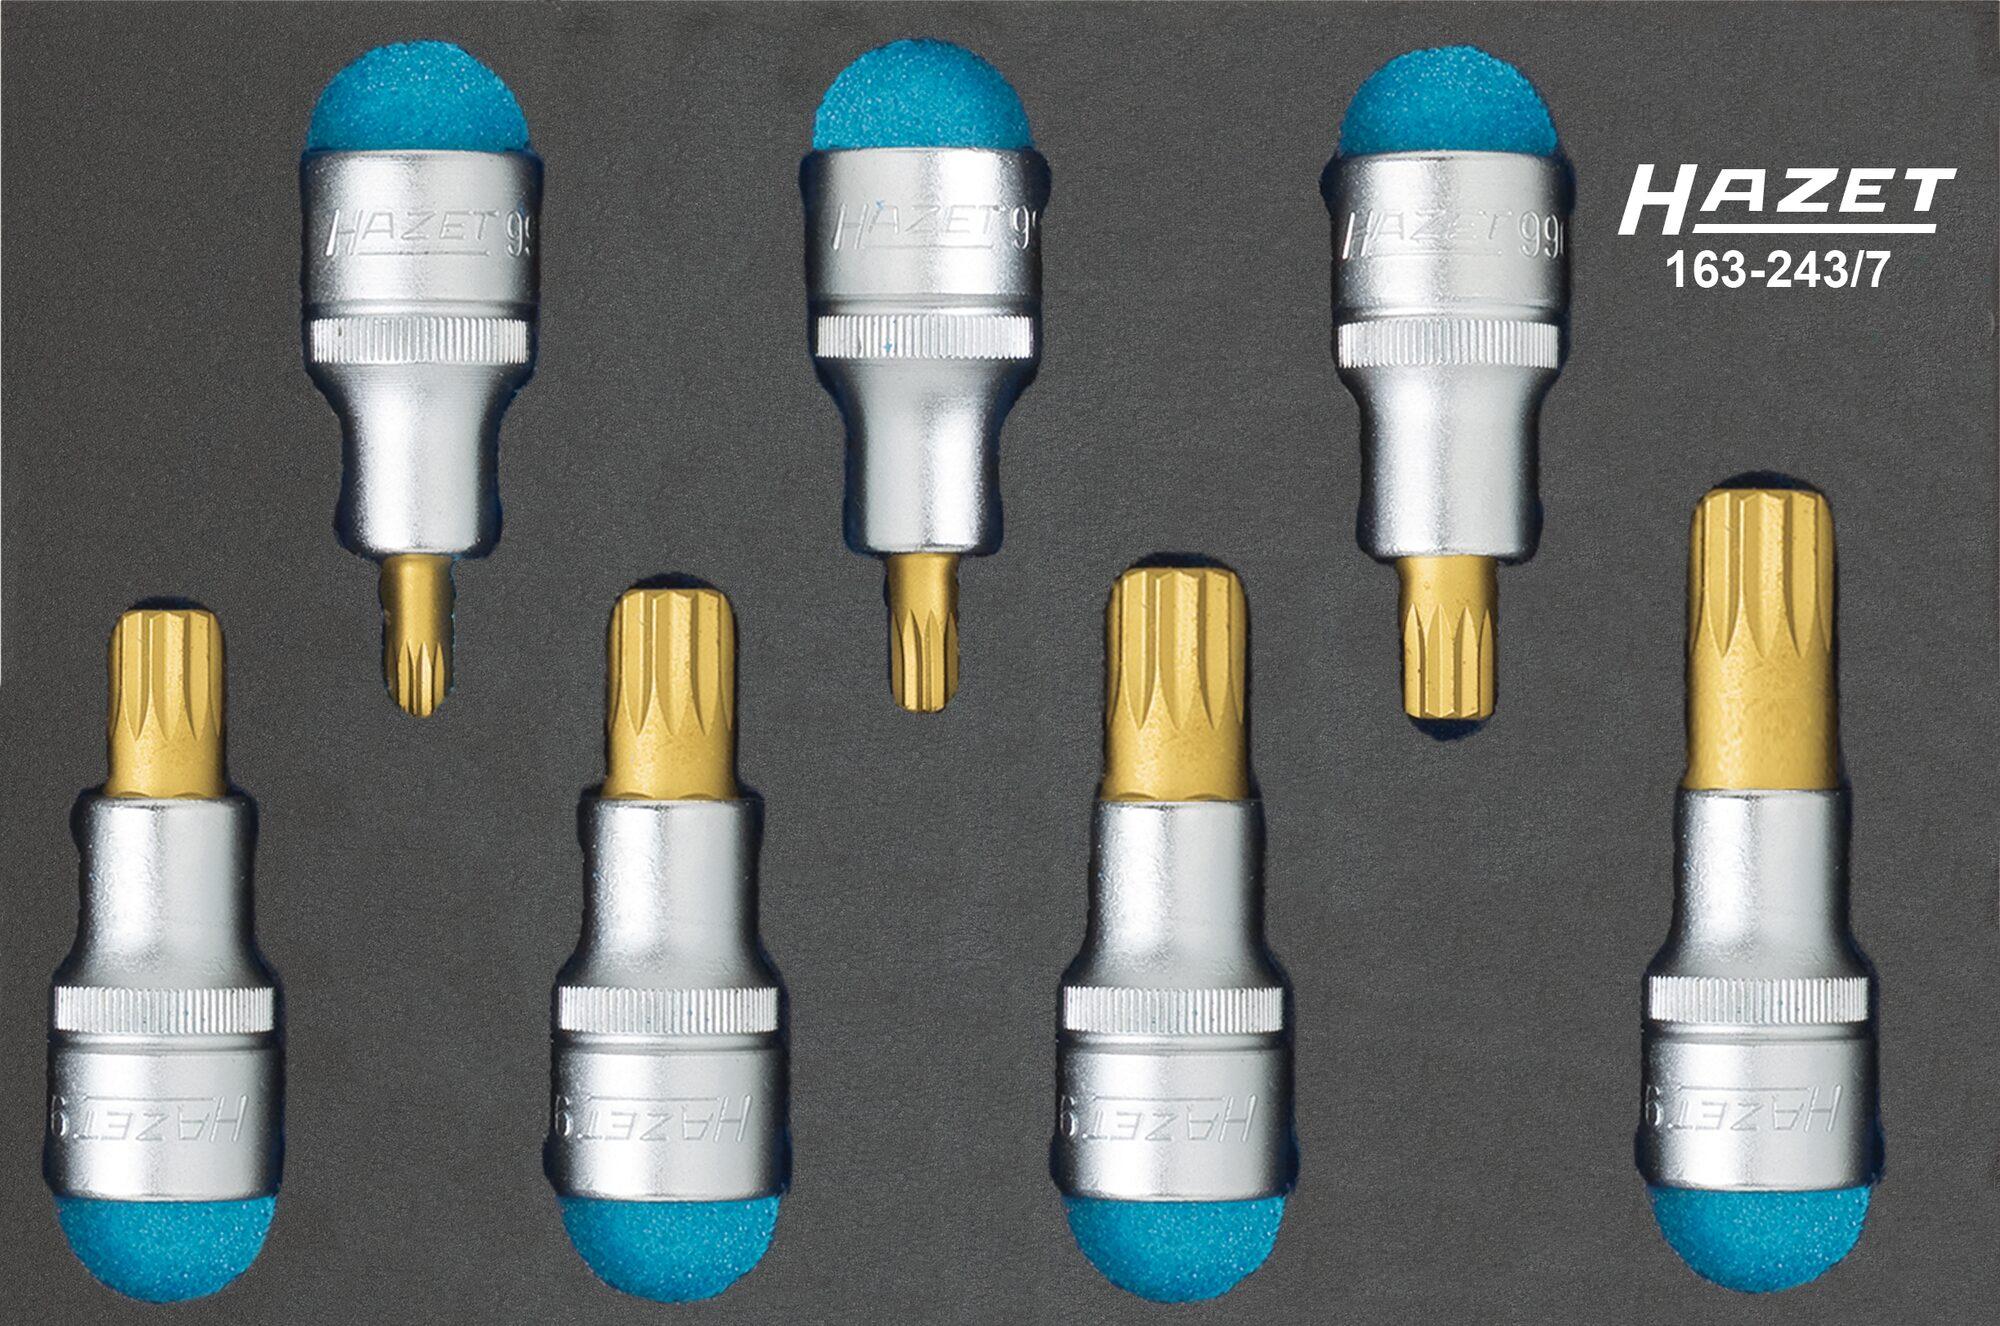 HAZET Schraubendreher-Steckschlüsseleinsatz Satz ∙ XZN 163-243/7 ∙ Vierkant hohl 12,5 mm (1/2 Zoll) ∙ M6–M18